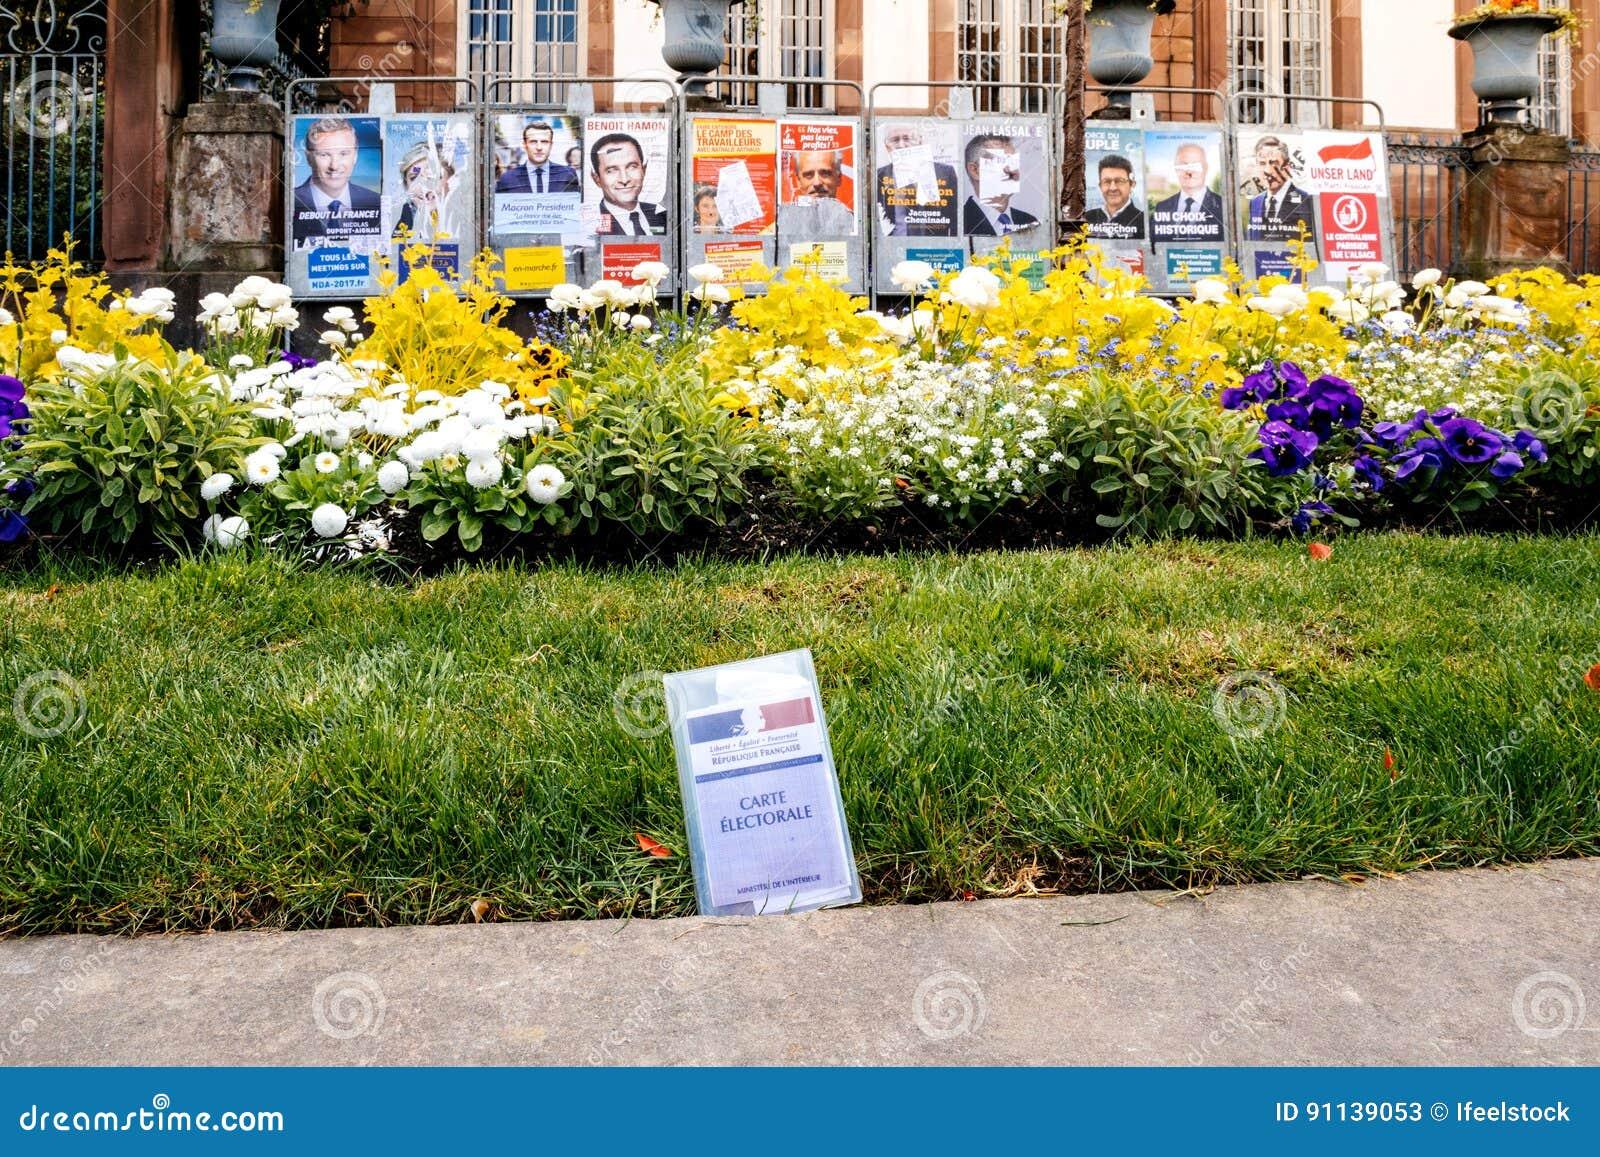 Strasbourg city hall voters card carte electorale